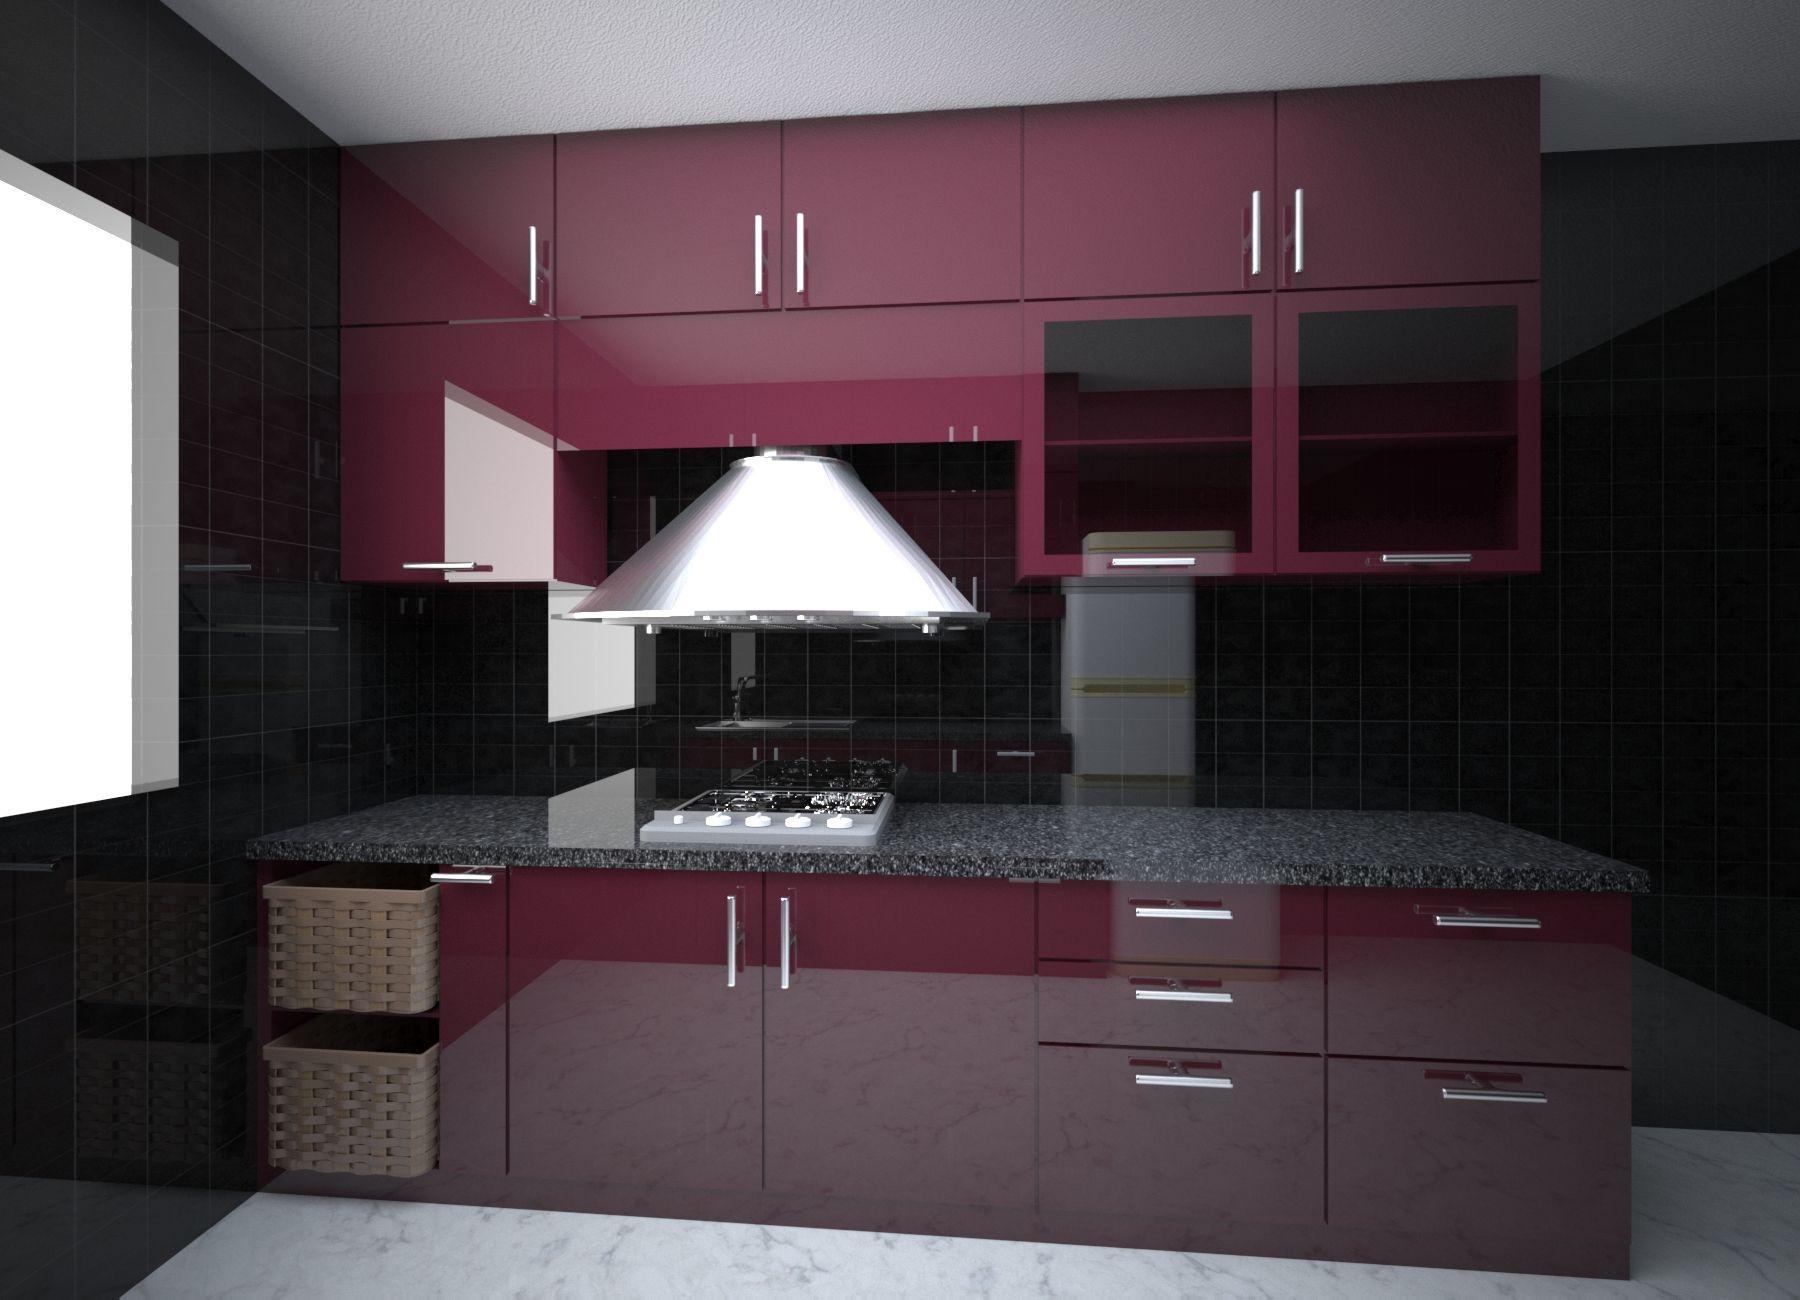 Modular Kitchen Interior Design Vegetable Basket Hob Chimney Include Tall Unit Interior Design Kitchen Residential Interior Design Kitchen Cabinet Design